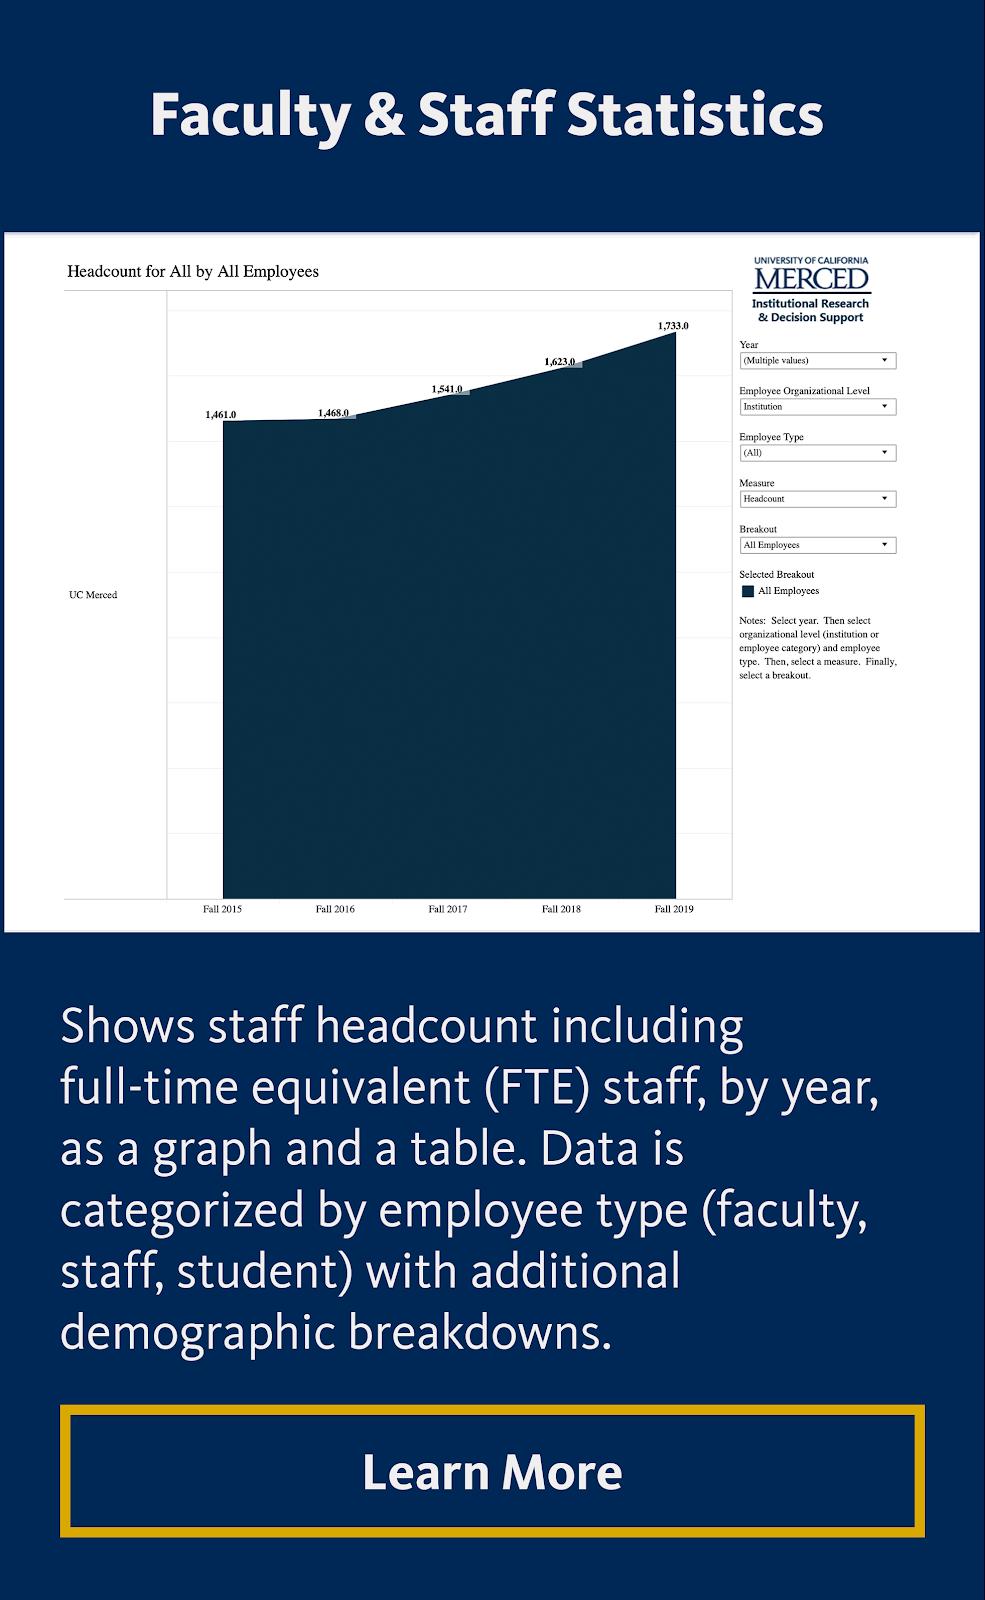 Faculty & Staff Statistics Interactive Data